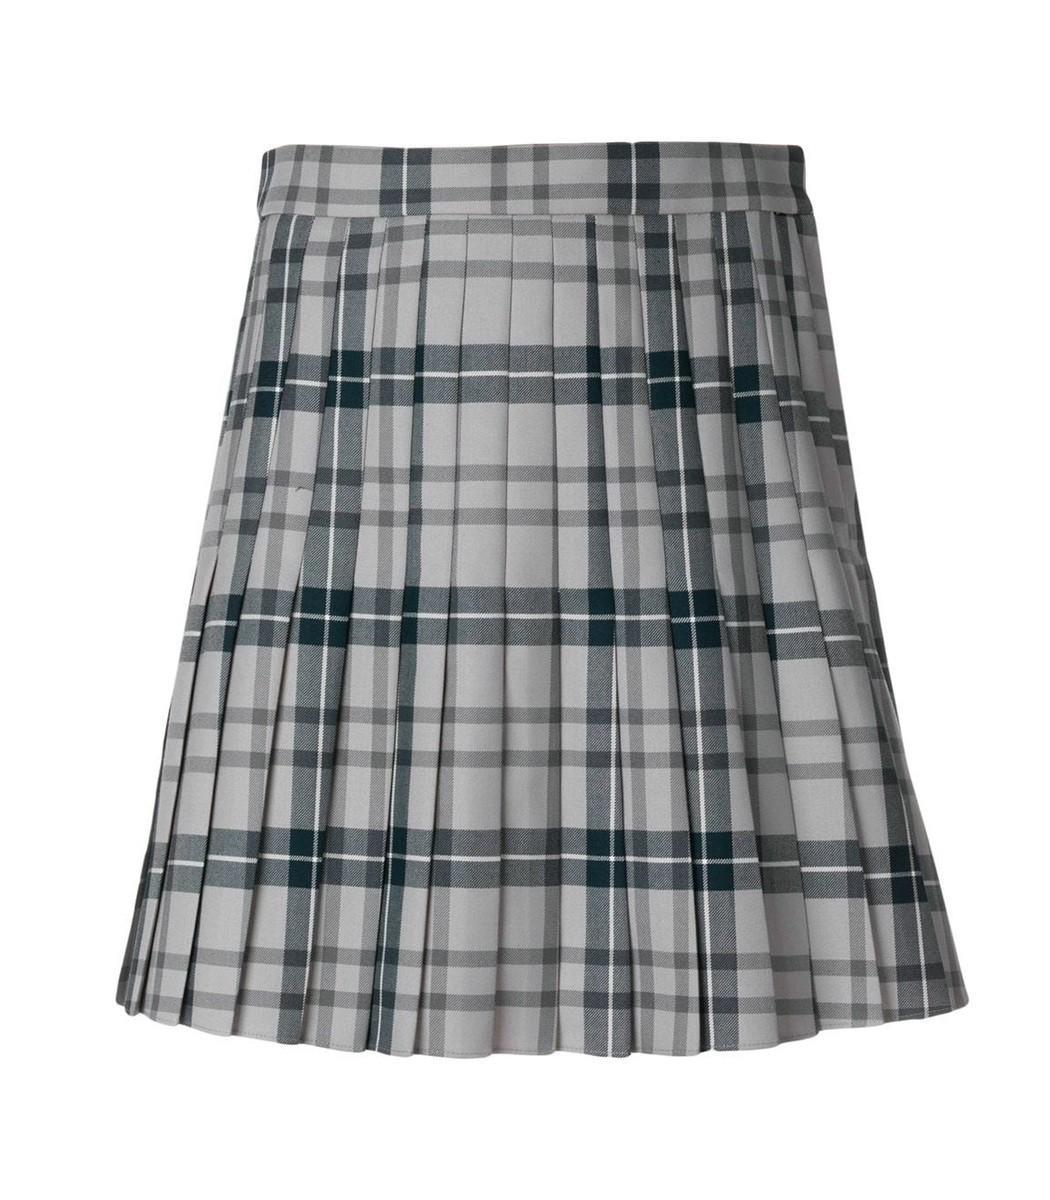 Thom Browne Pleated Skirt In Grey